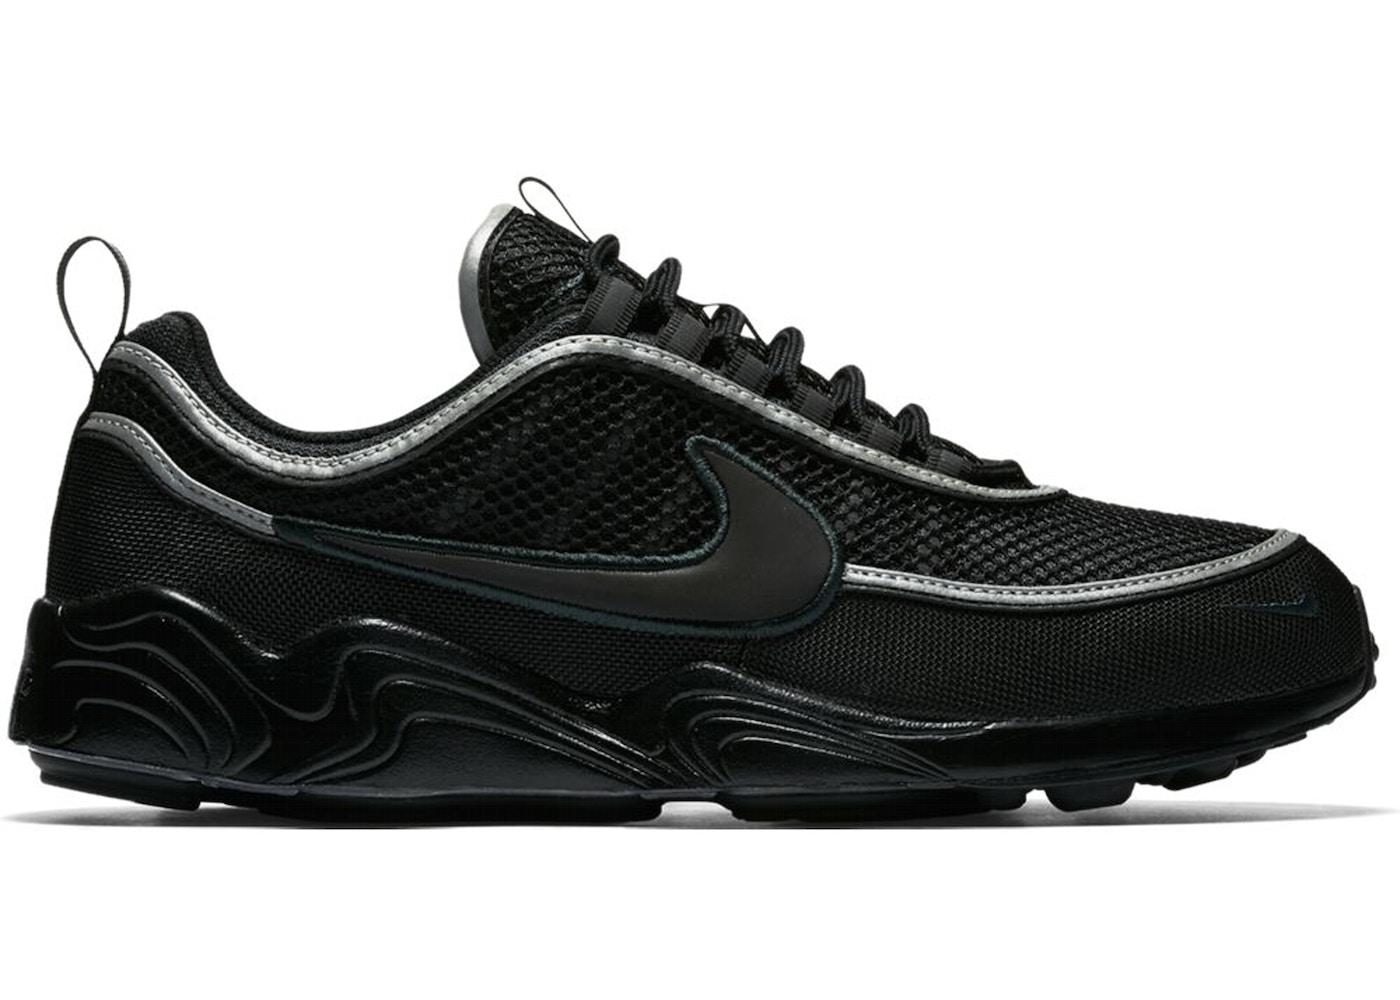 Won Ortodoxo Negar  Nike Air Zoom Spiridon 16 Black - 926955-001